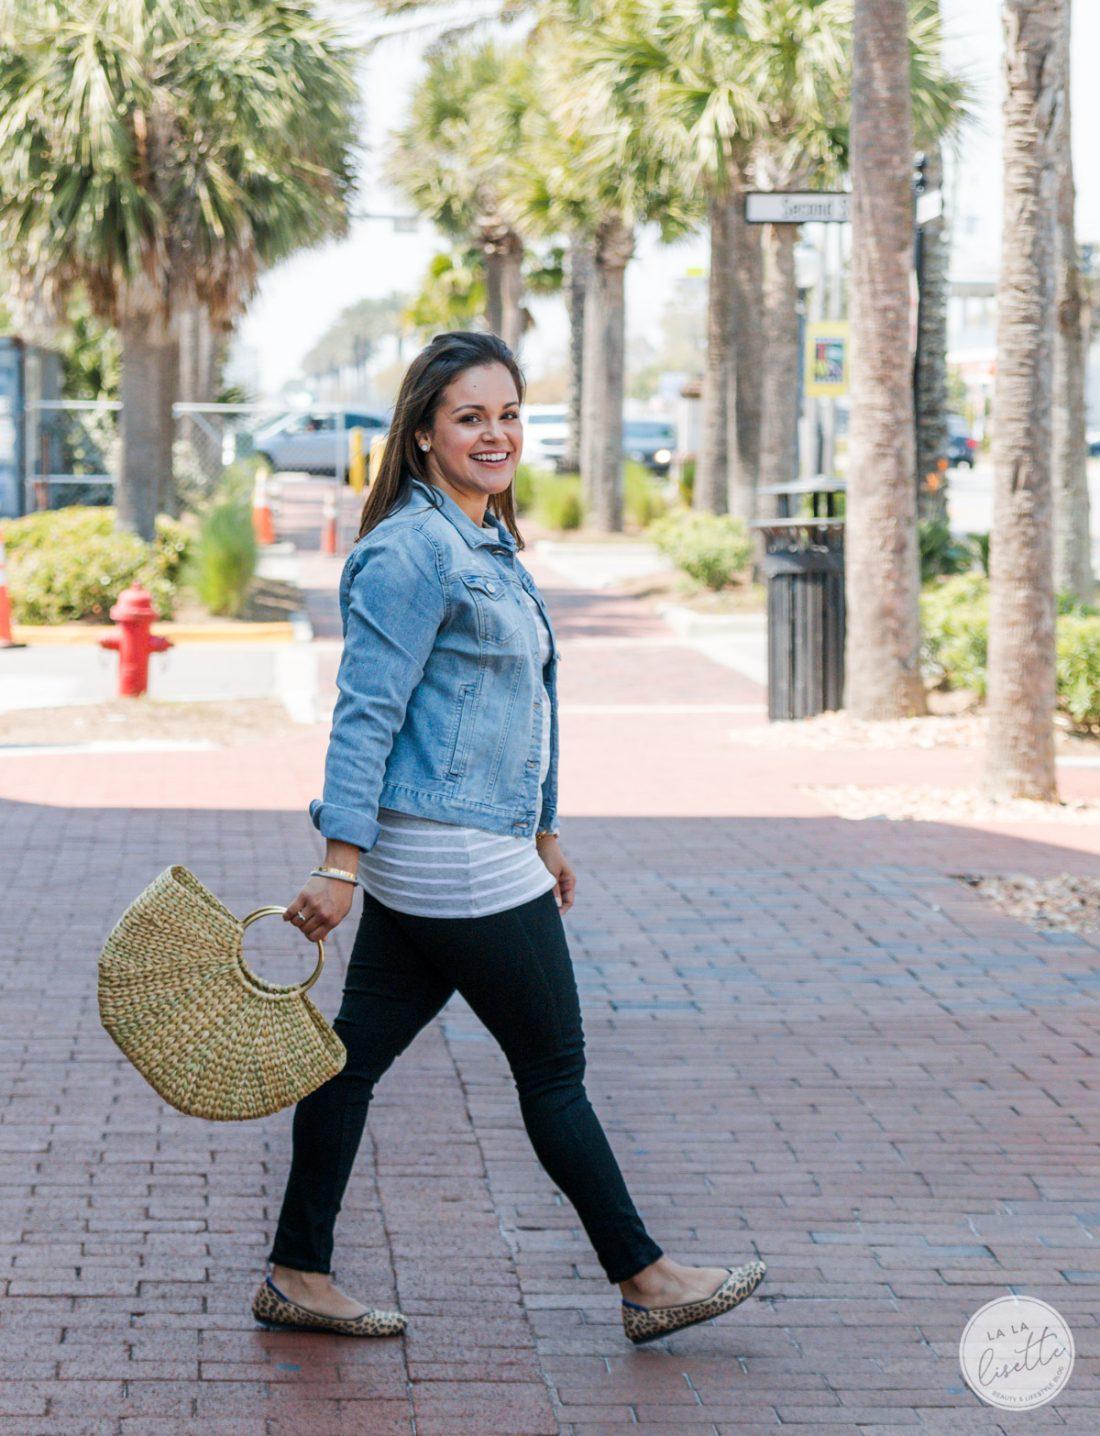 woman wearing spring clothes from Walmart: a jean jacket and top #WeDressAmerica #WalmartFashion https://ooh.li/fa4cfae